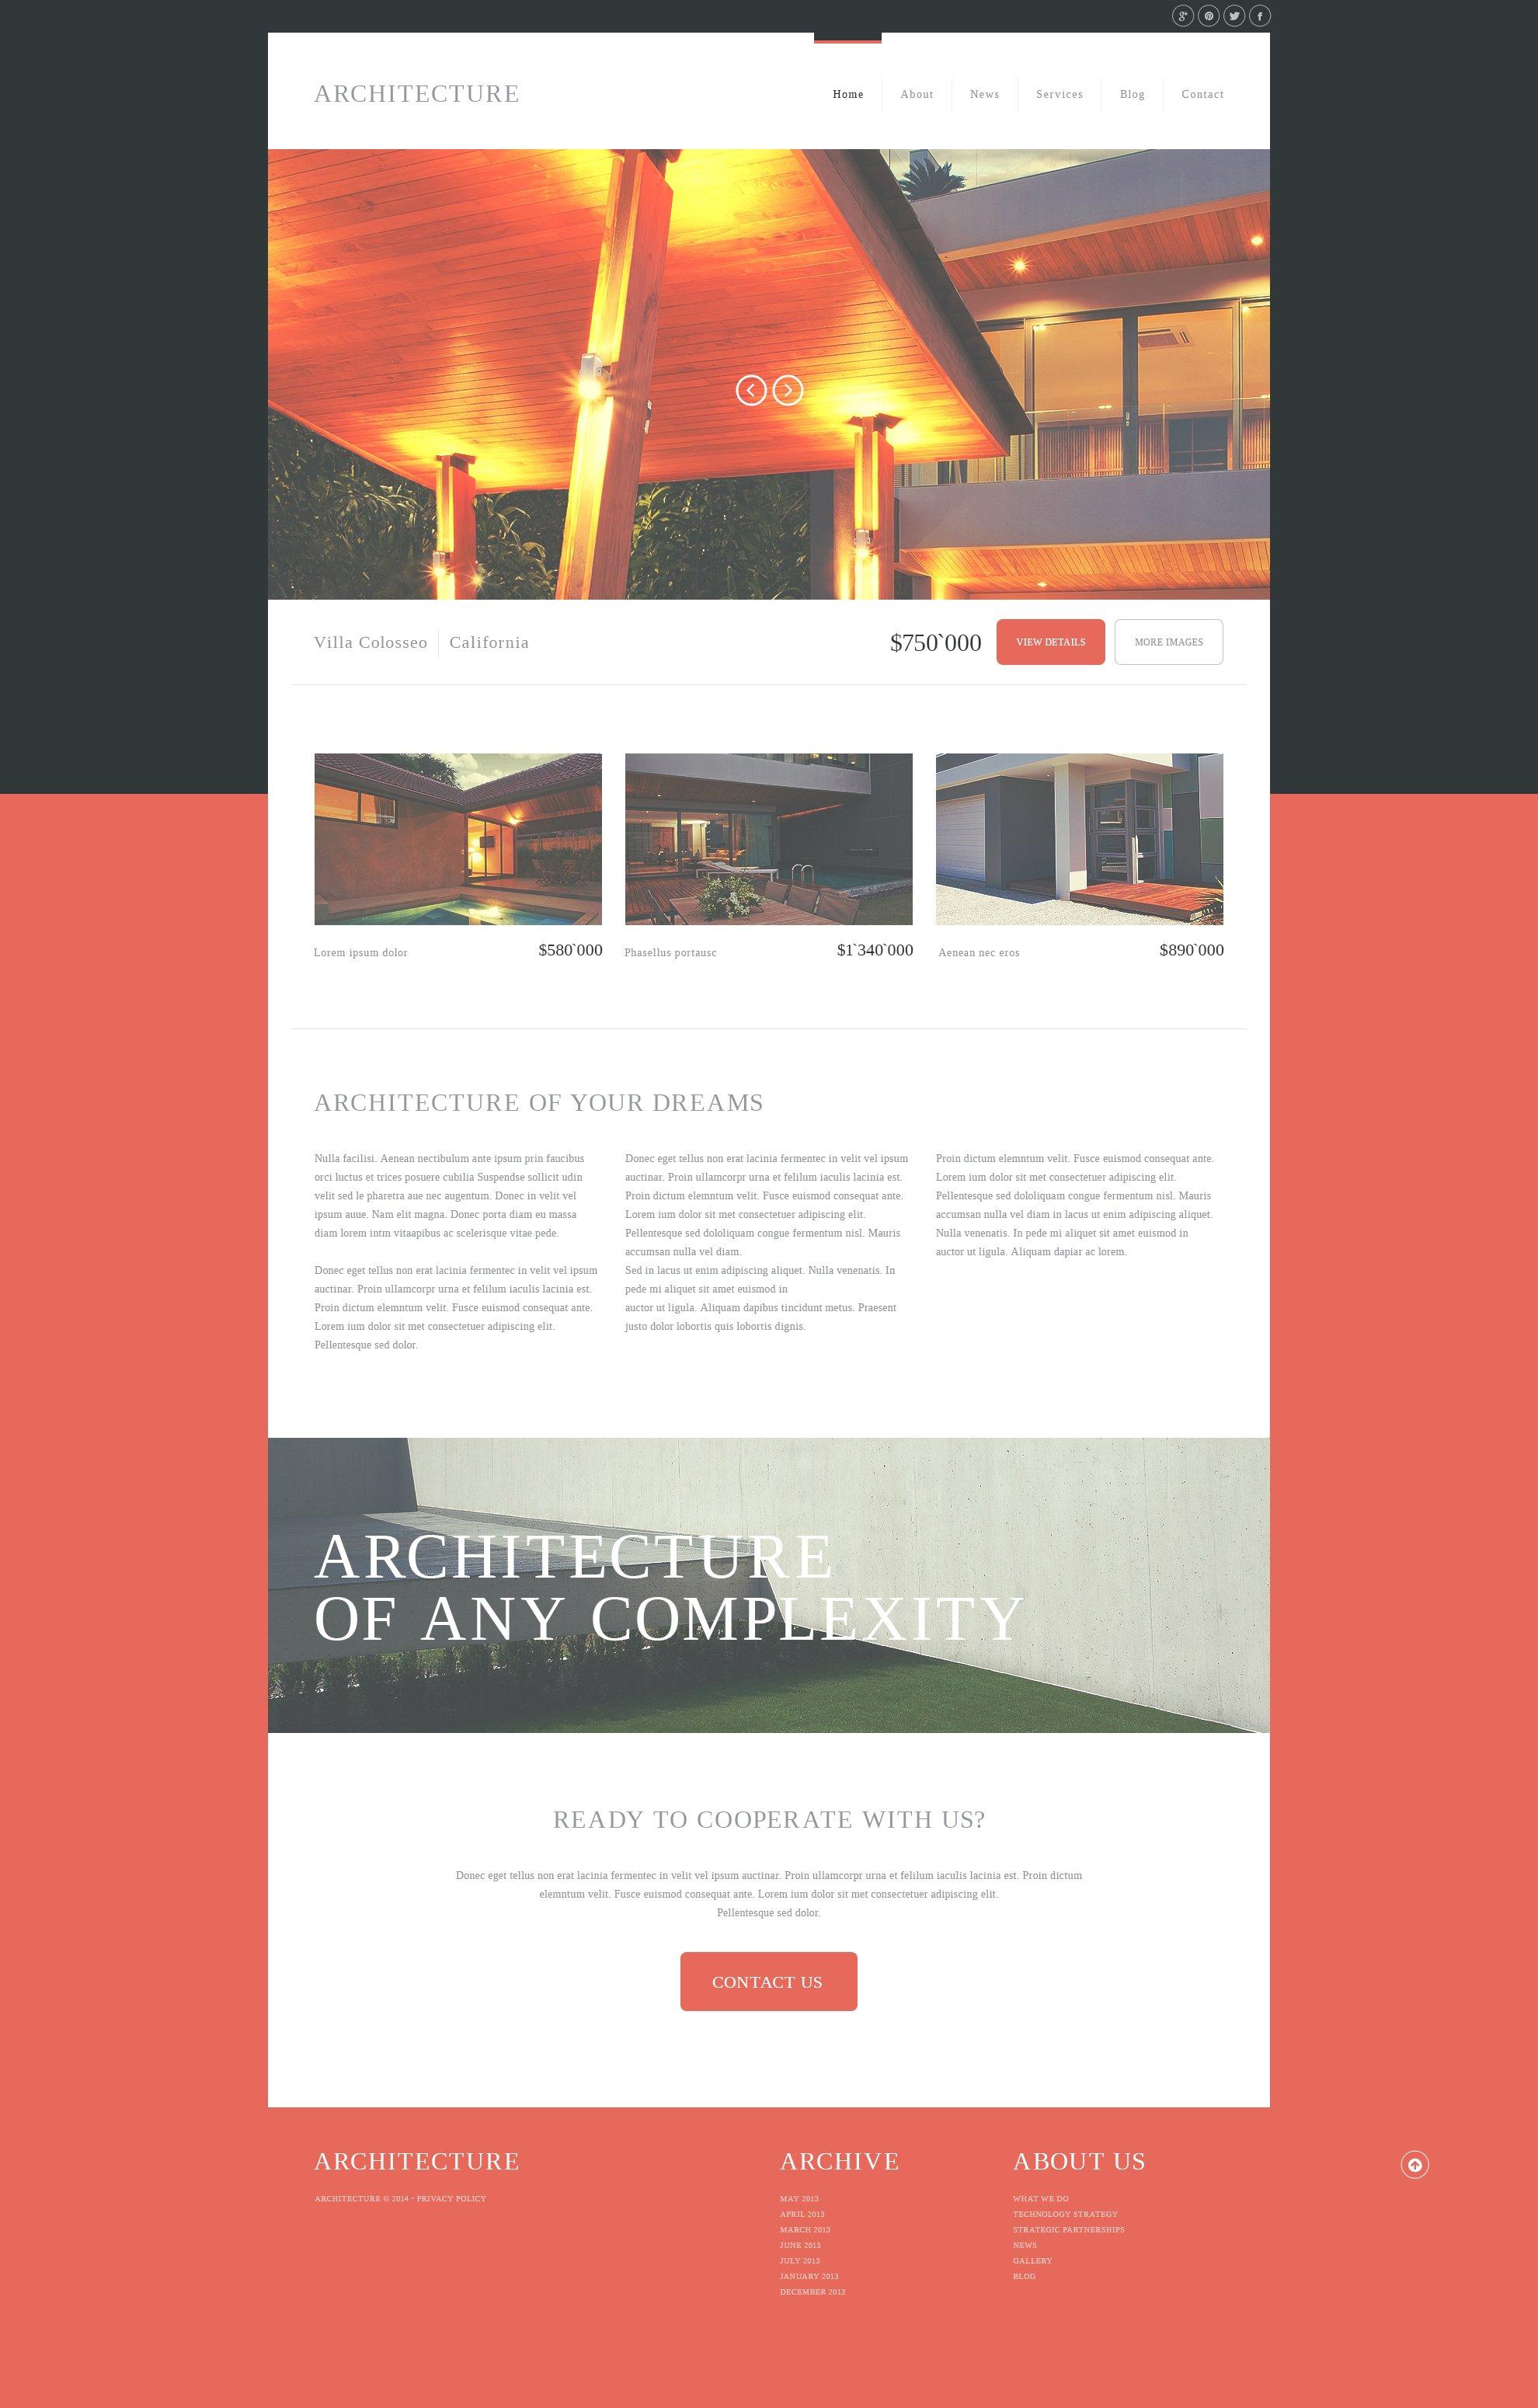 modern architecture joomla template 50882. Black Bedroom Furniture Sets. Home Design Ideas